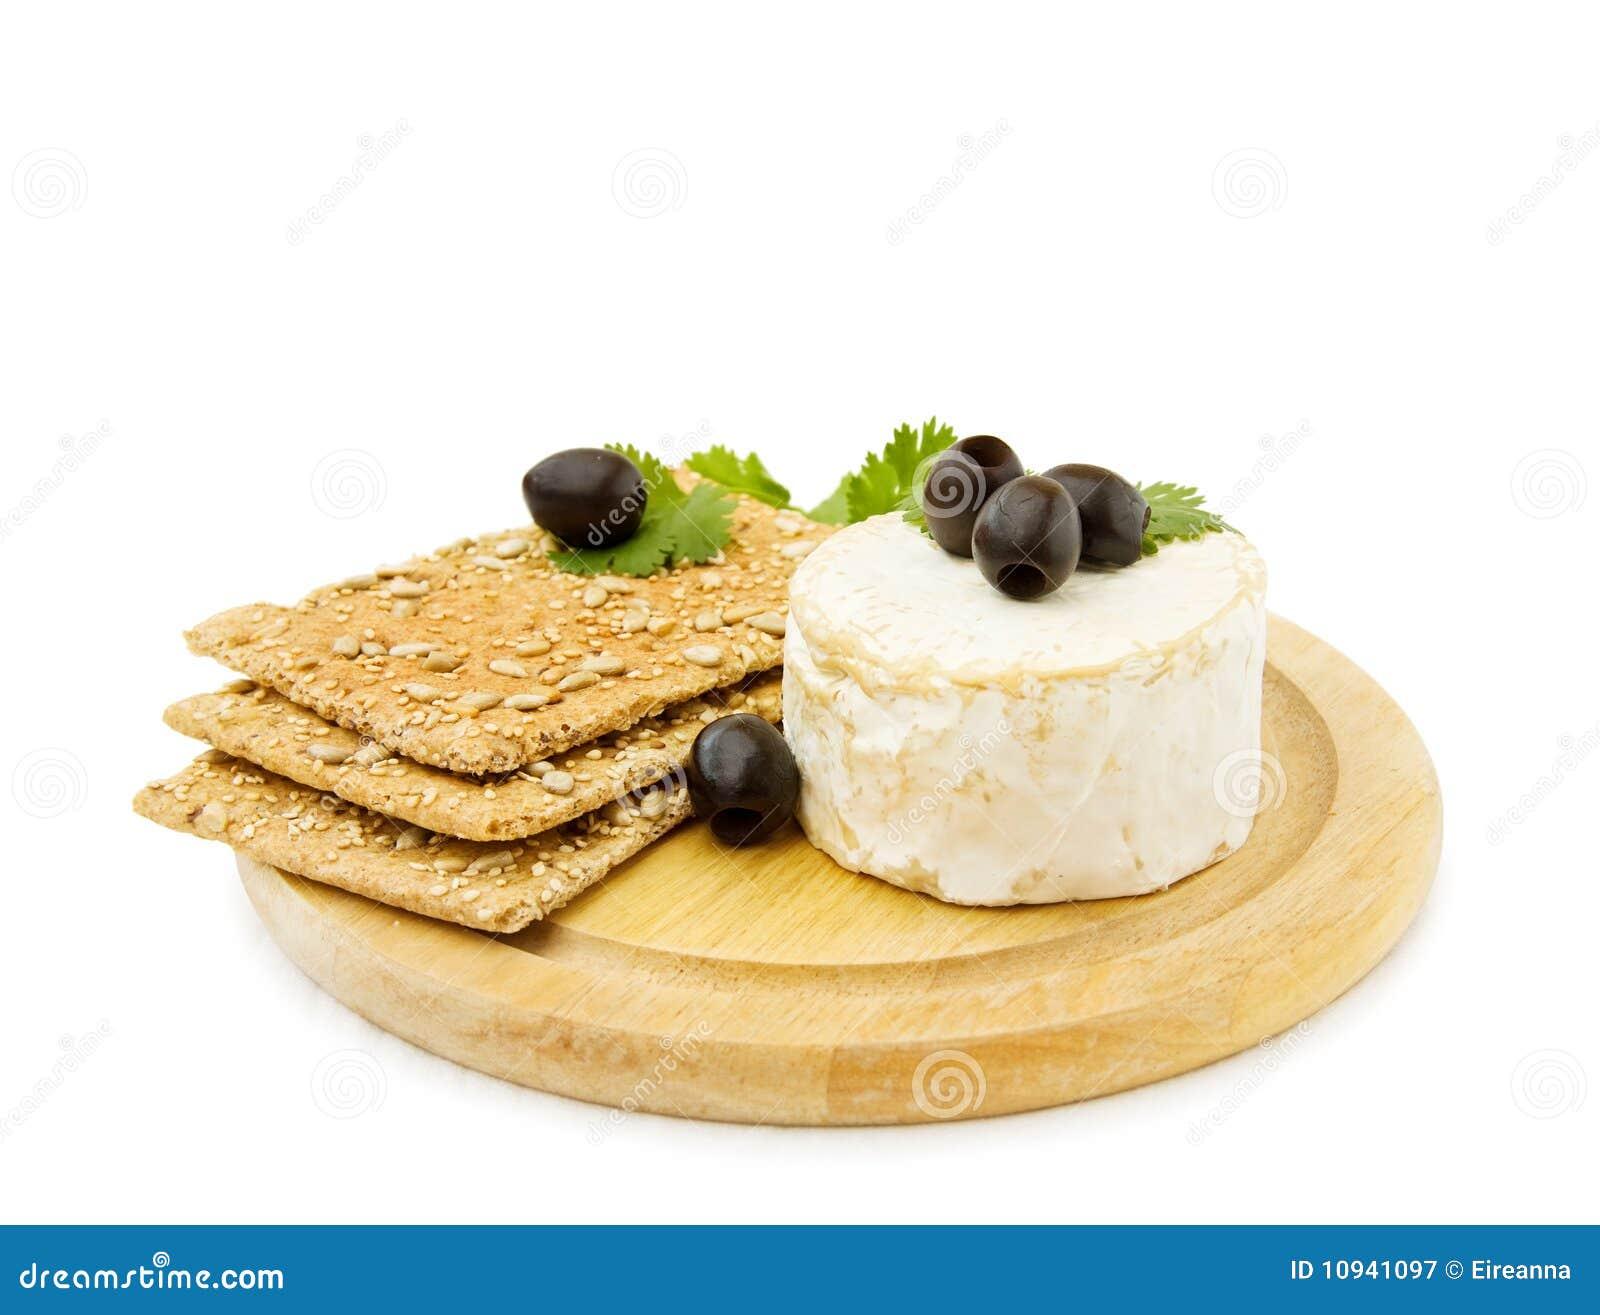 шутихи сыра brie органические